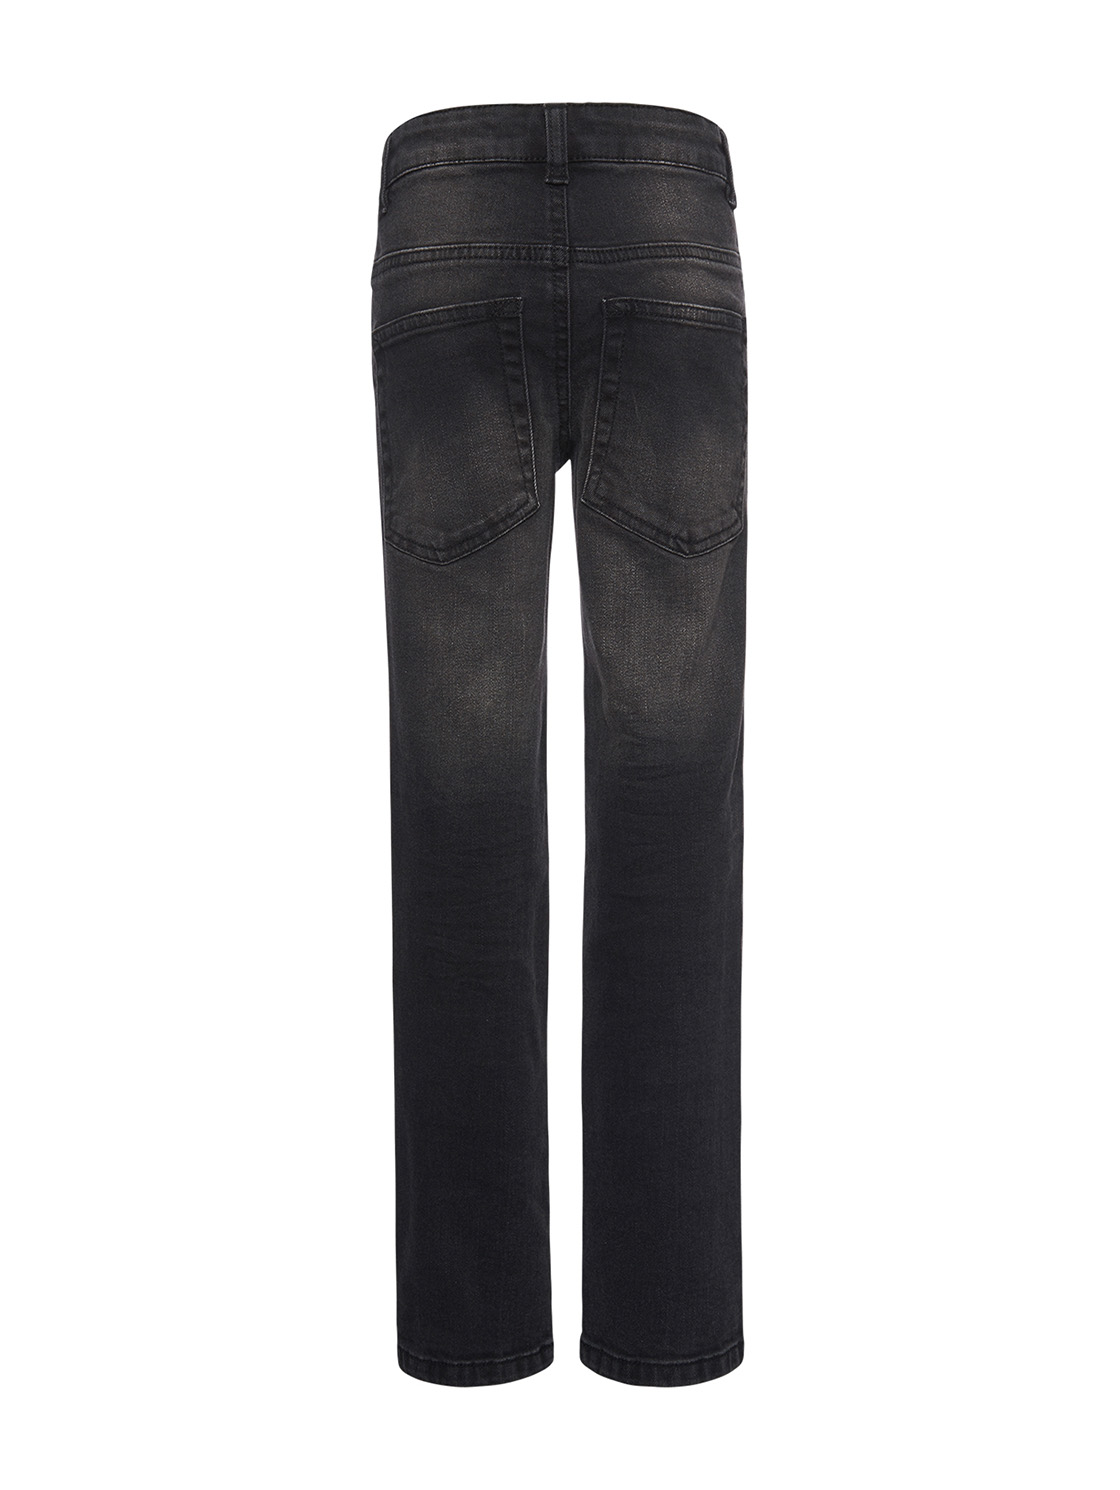 Jeans uni long, rinsed black denim